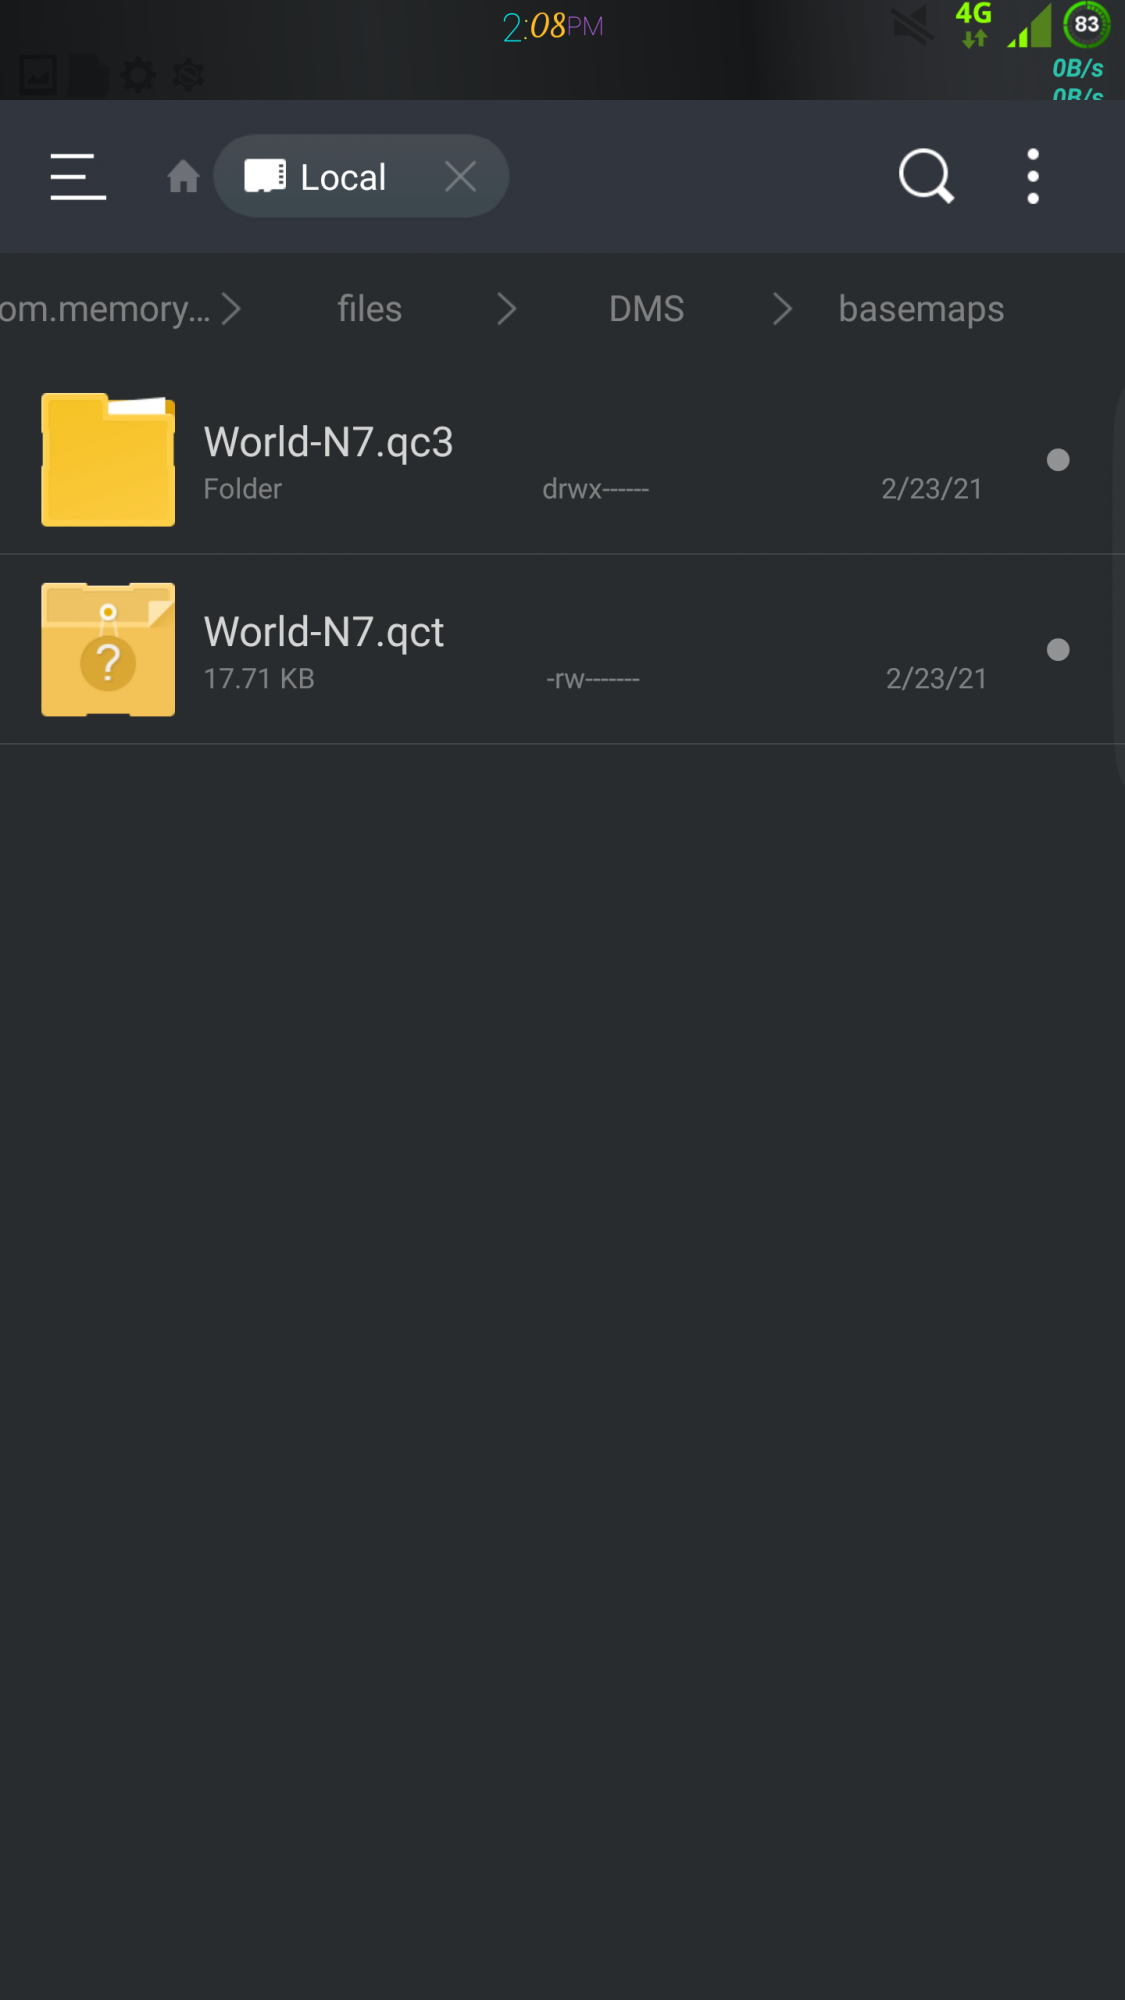 Screenshot_2021-02-23-14-08-52.png